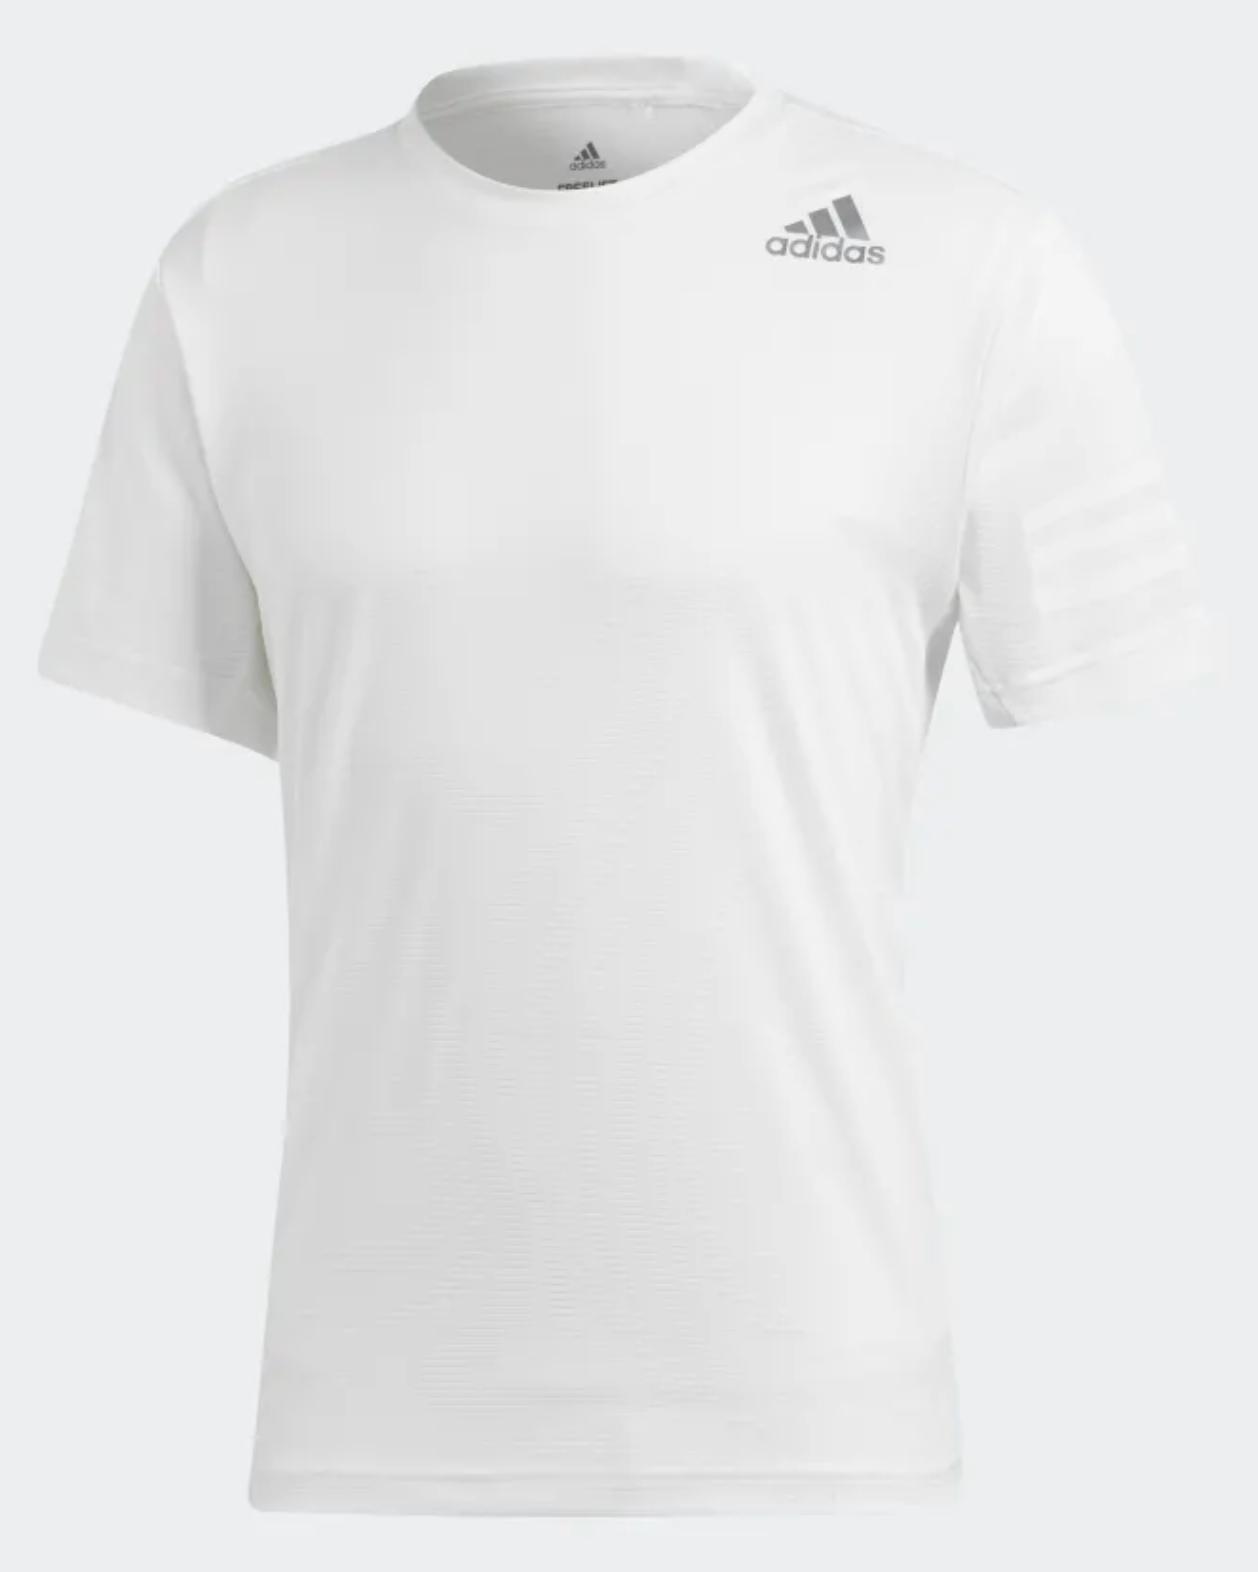 Camiseta hombre Adidas, camiseta rebajas adidas, rebajas adidas